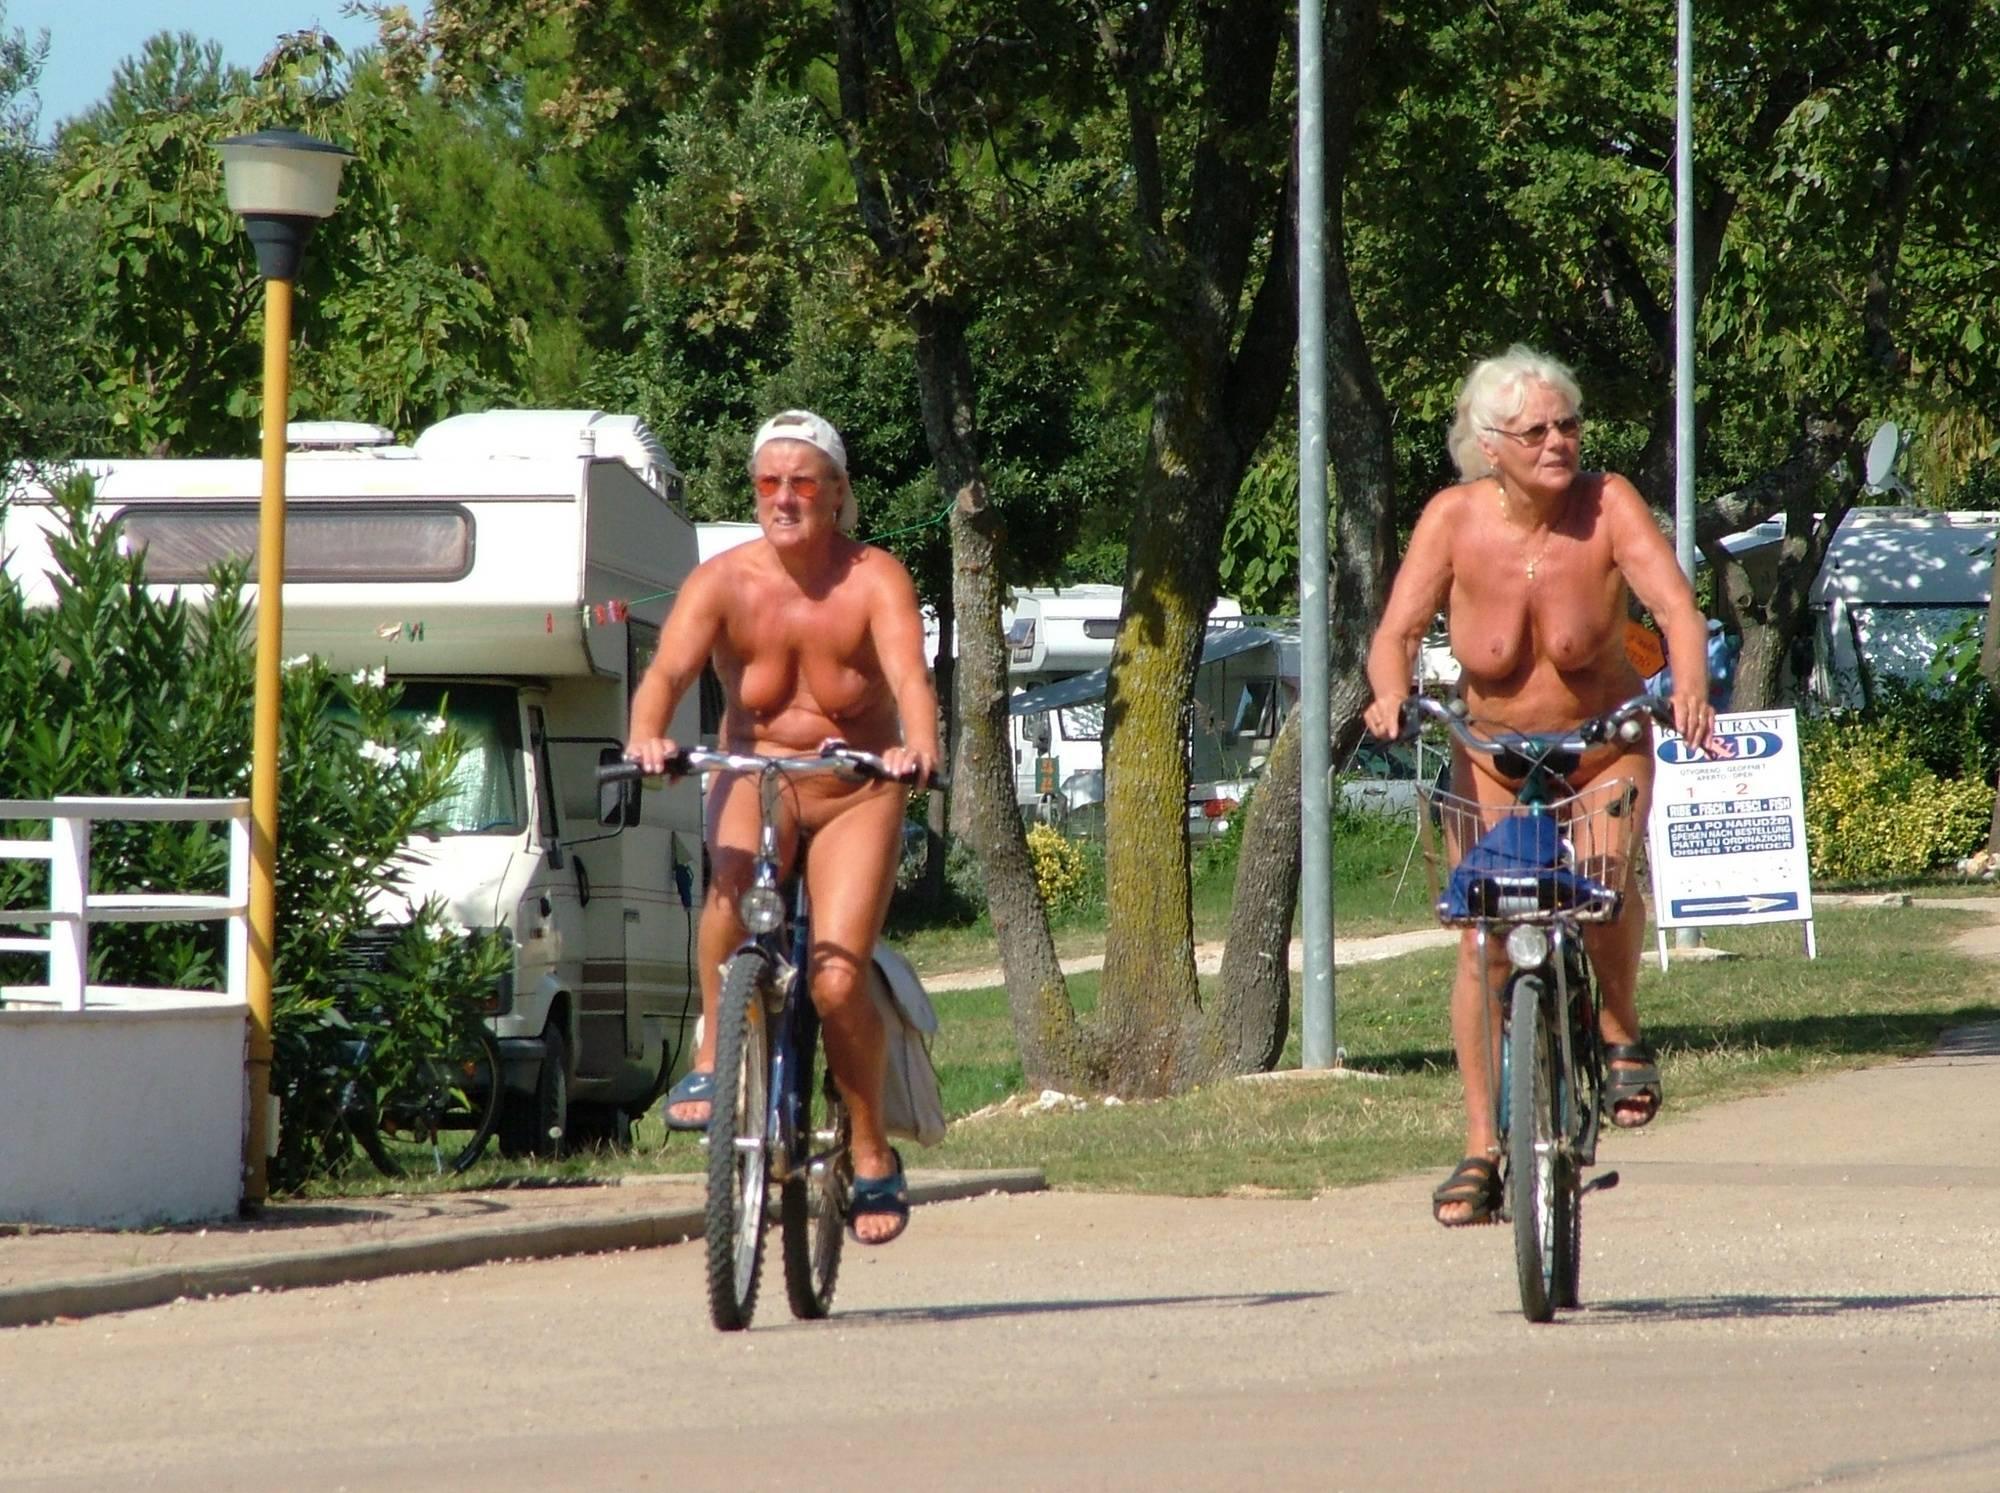 Nudist Photos Naturist FKK Day Biking - 1